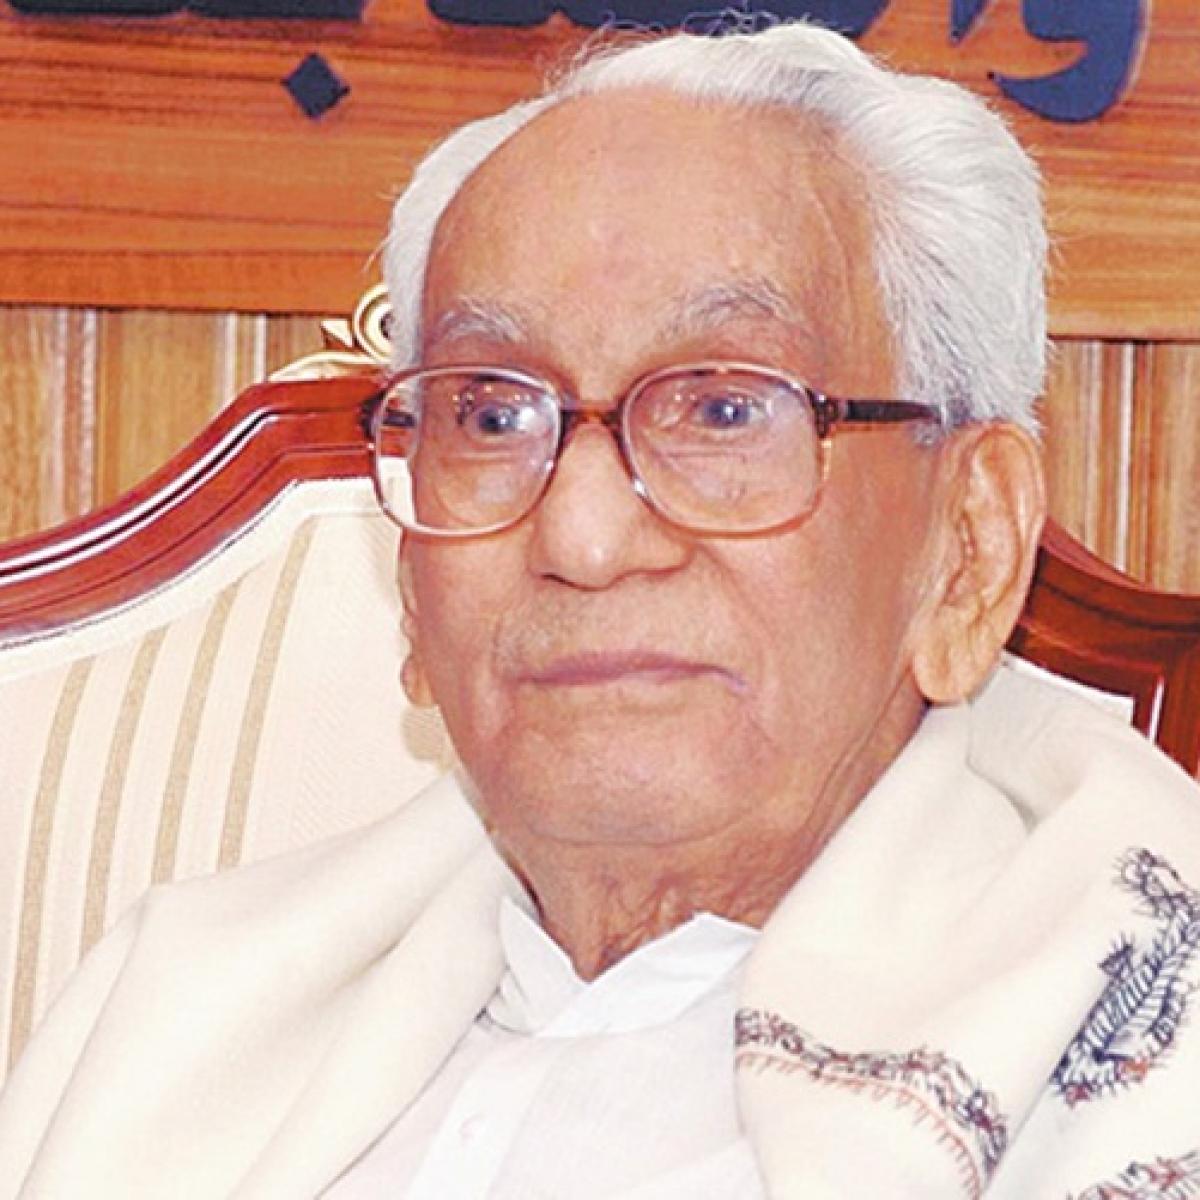 This Day 25 Years Ago with FPJ: Reprieve for Kerala CM Karunakaran